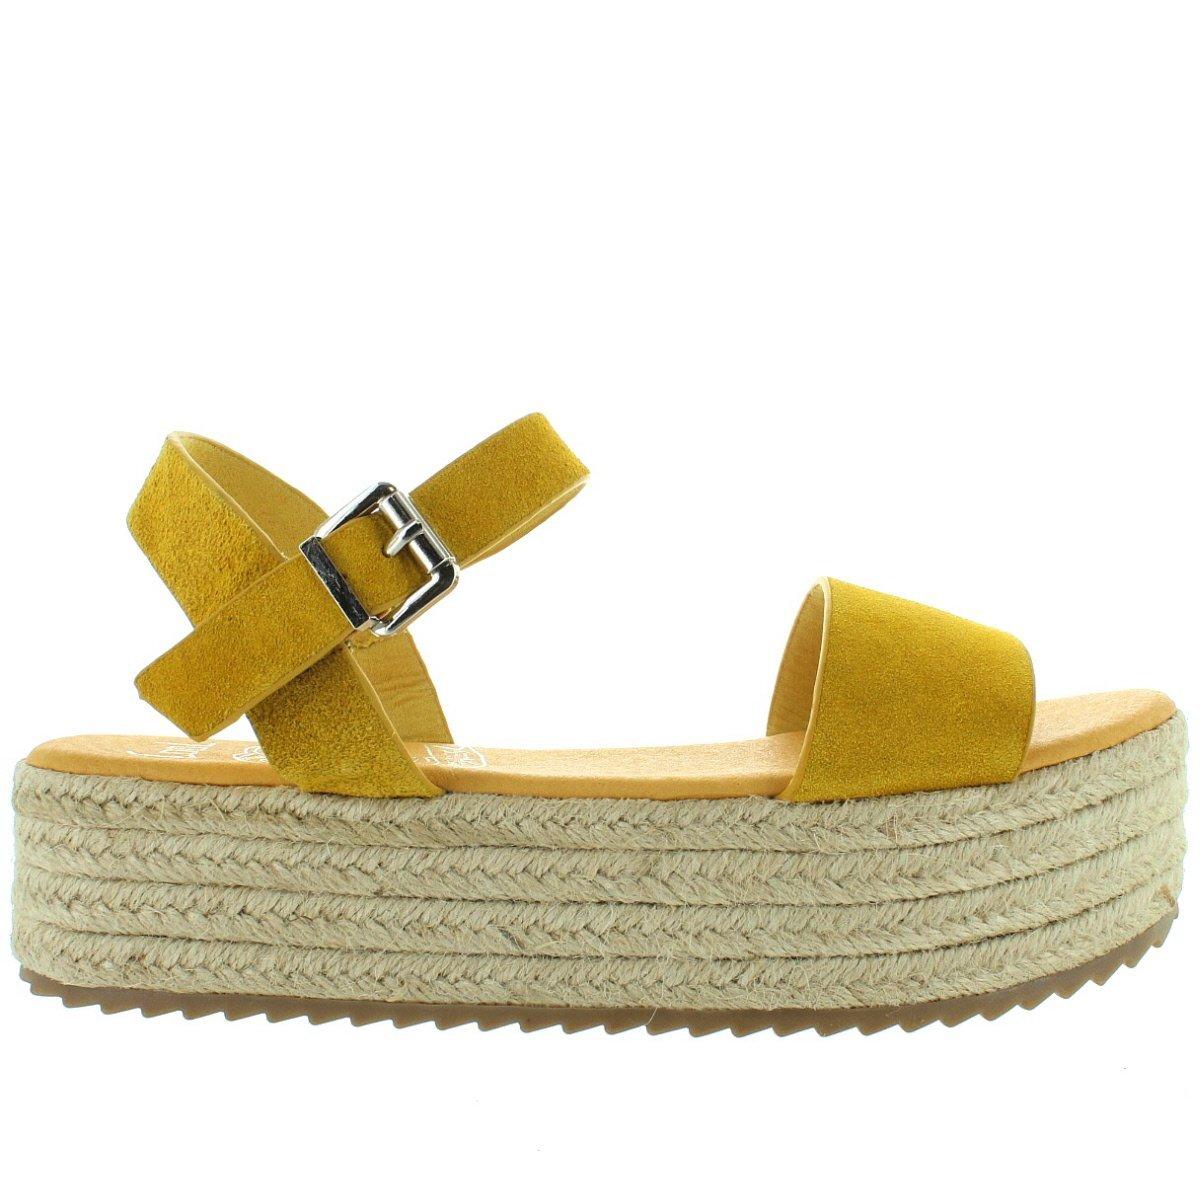 Coolway Mini - Mustard Espadrille Platform Sandal B07C58B6S9 37 M EU Sand